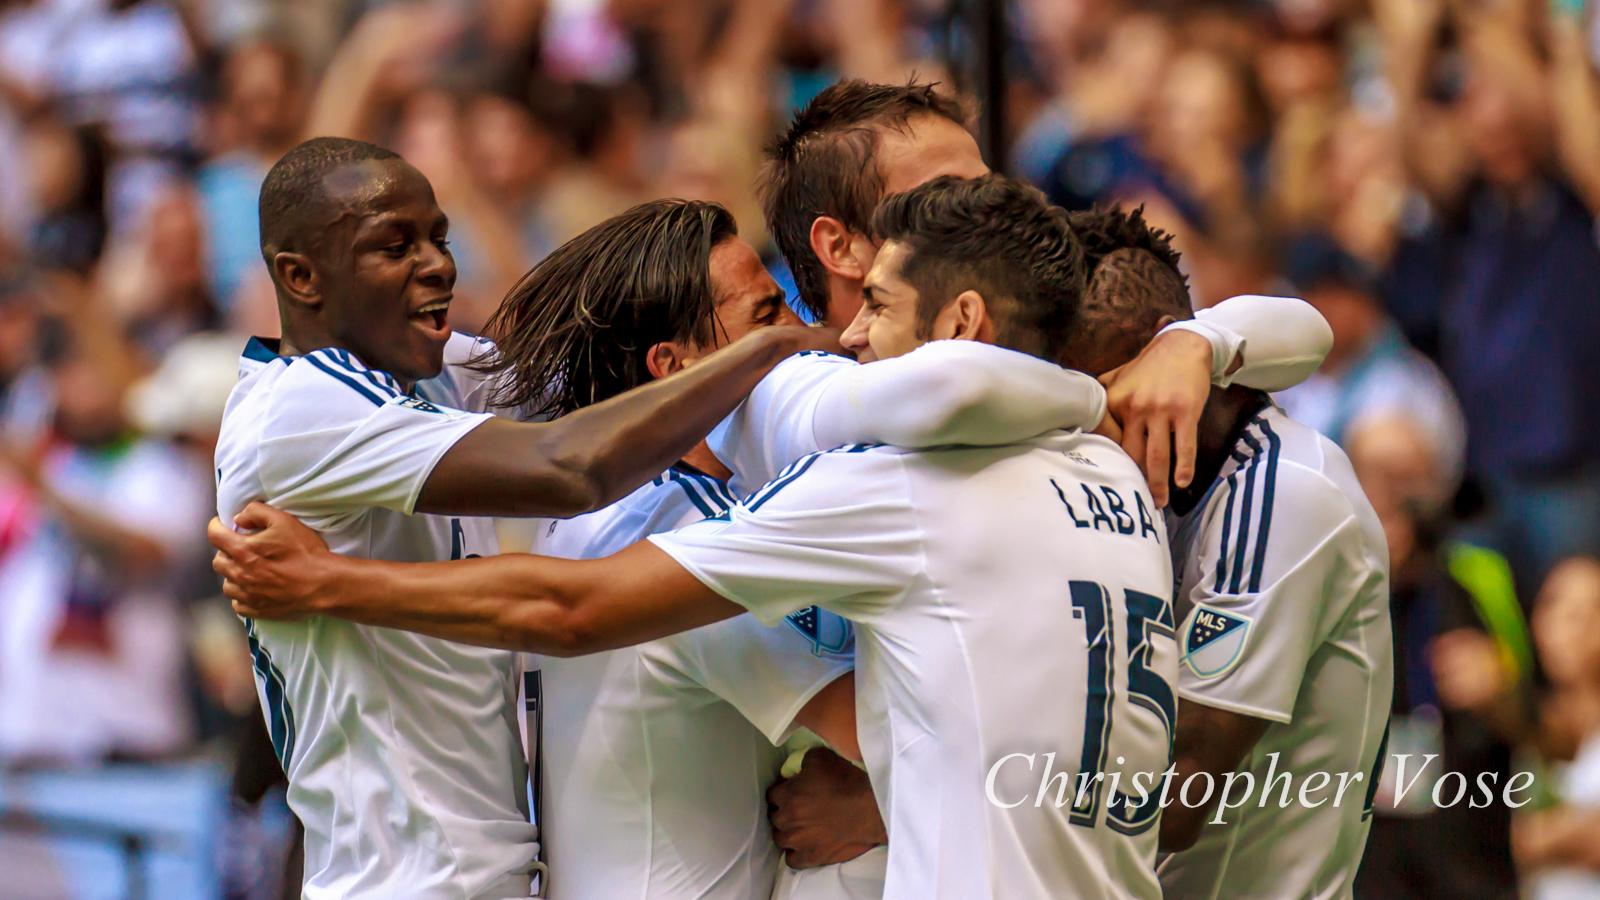 2015-07-26 Octavio Rivero Goal Celebration.jpg